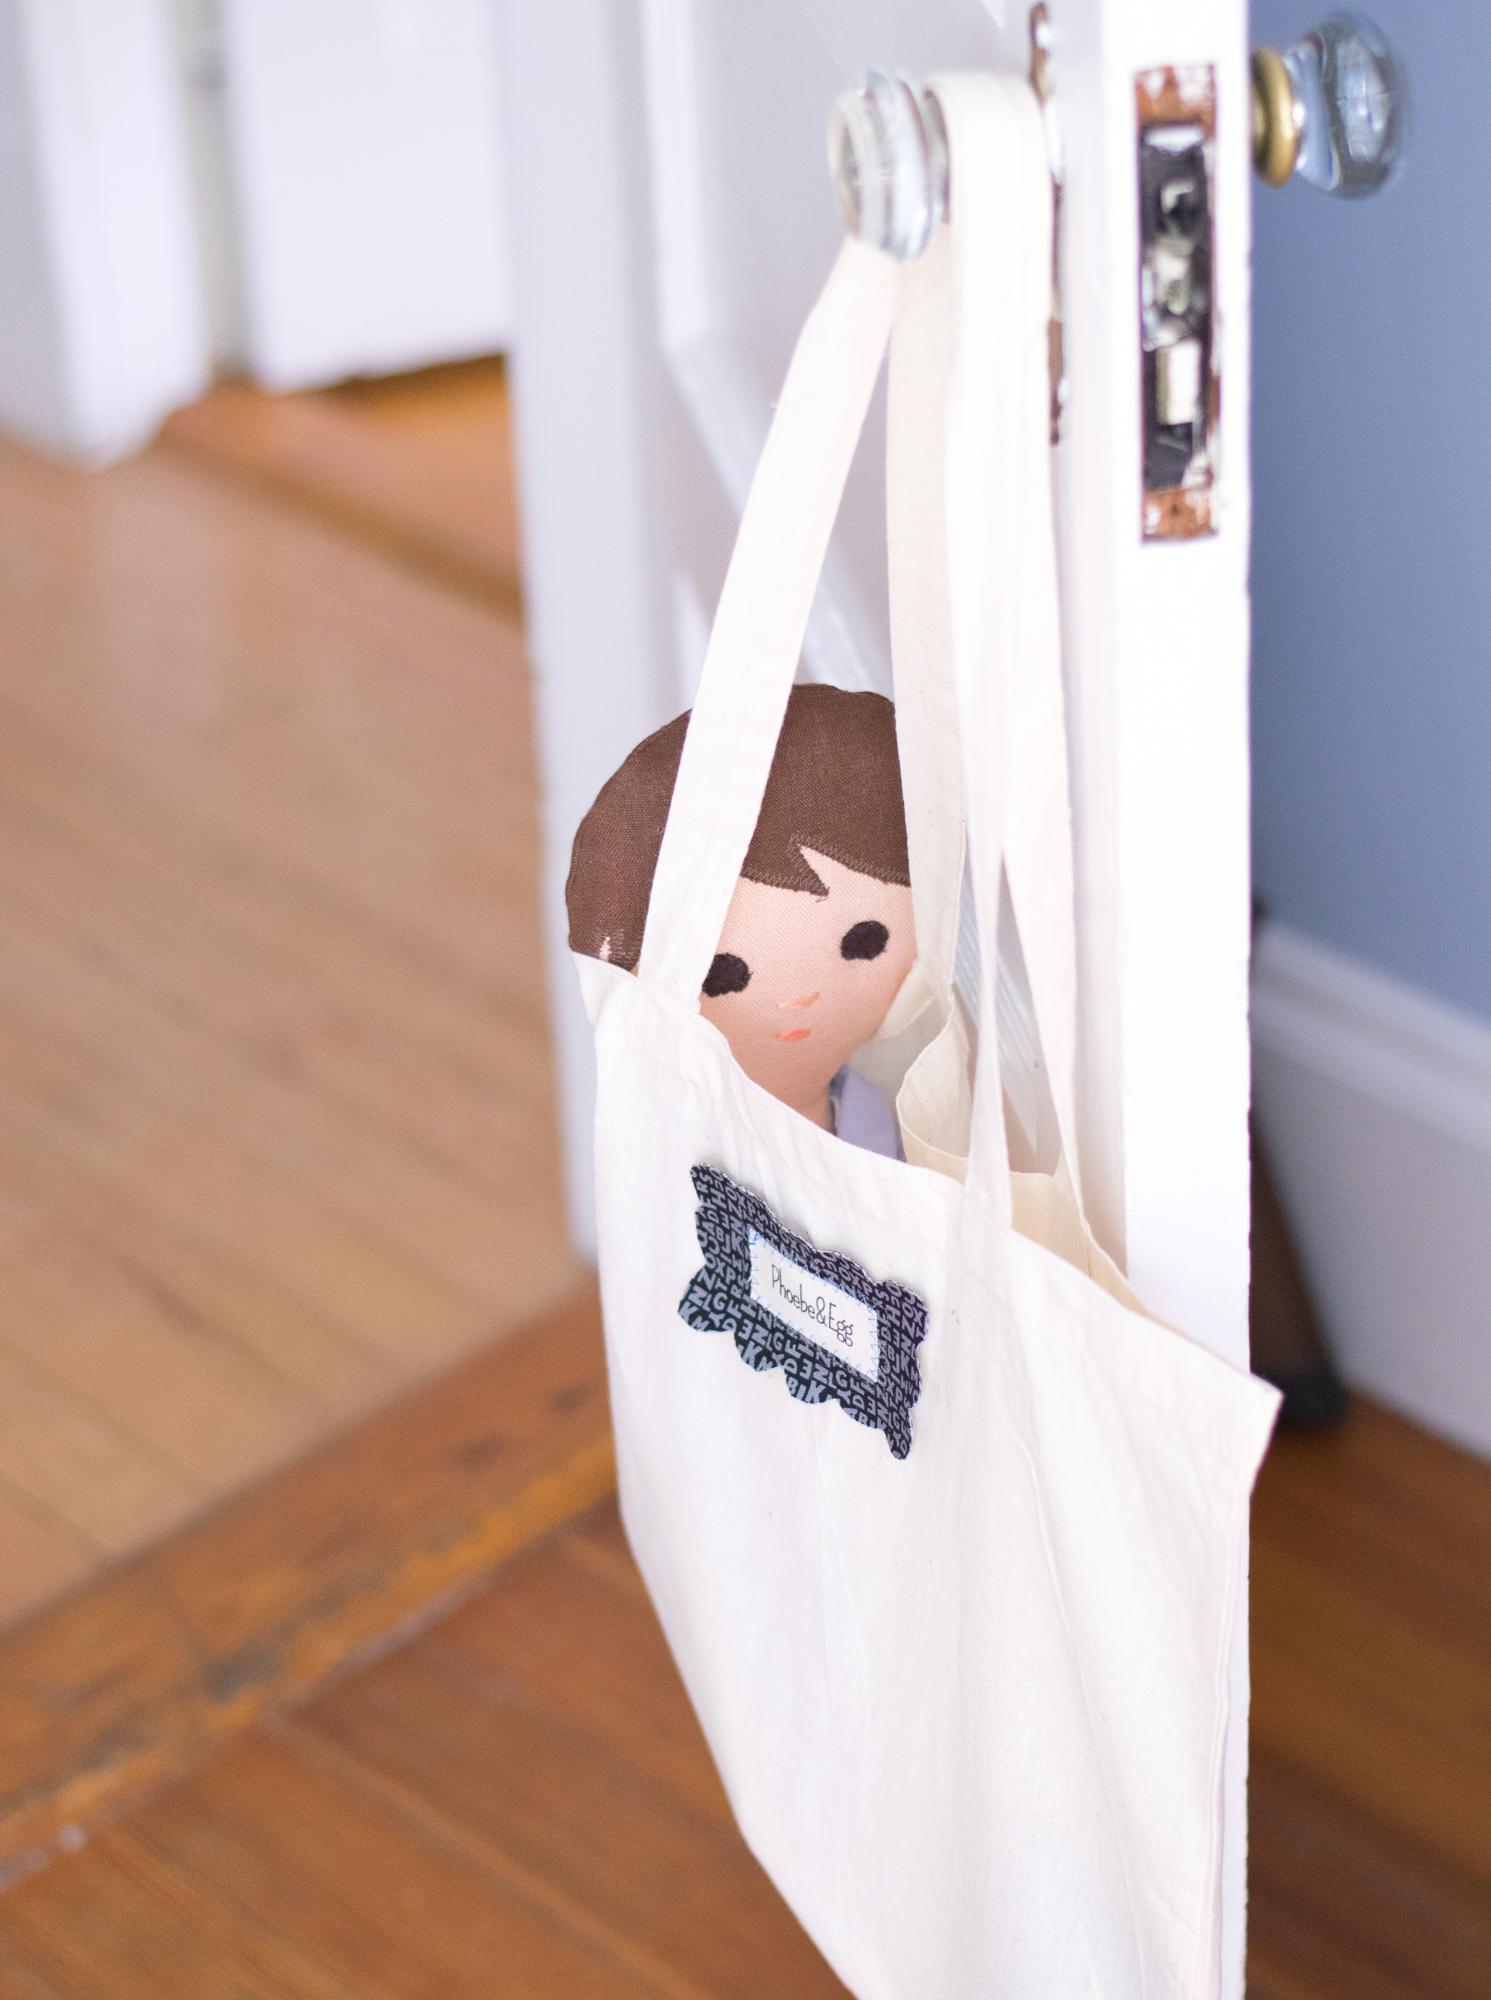 Gallery of Dolls-24.jpg